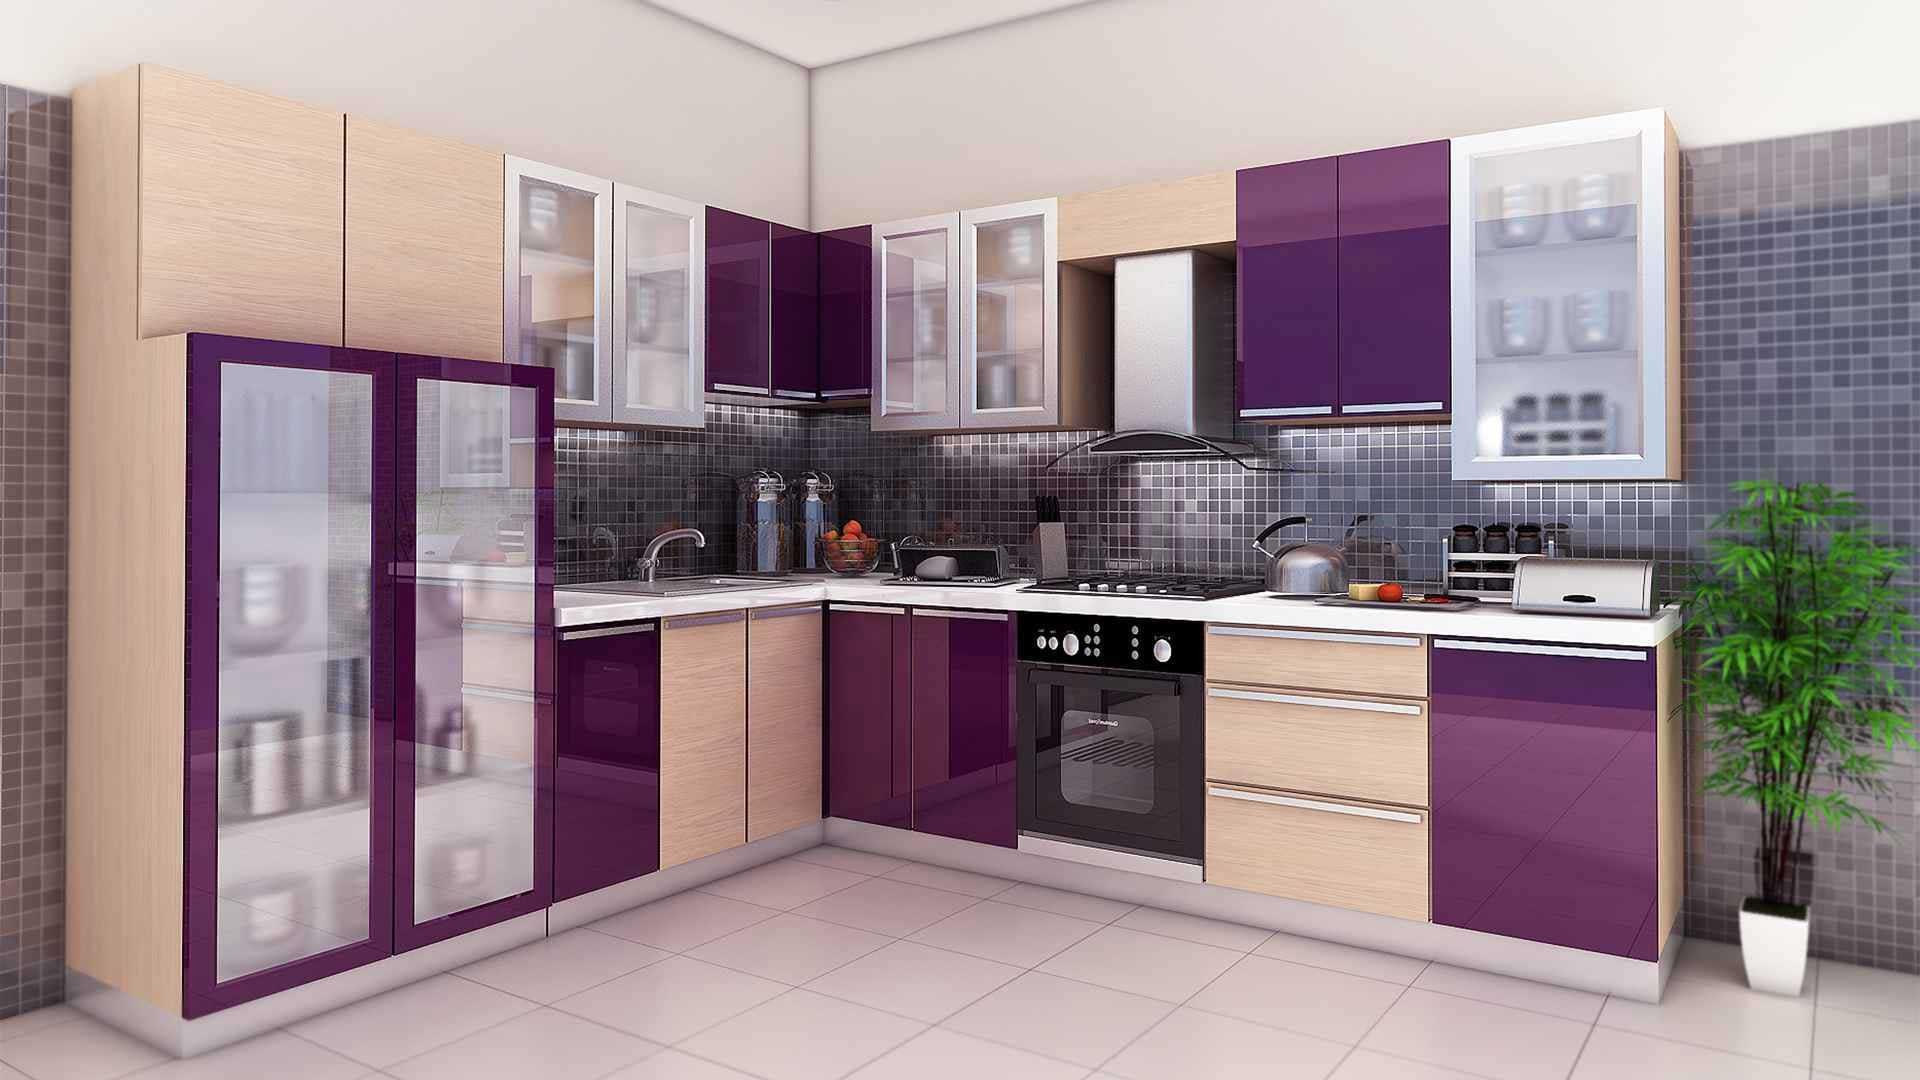 interior designer in gurgaon   modular kitchen in gurgaon   modern